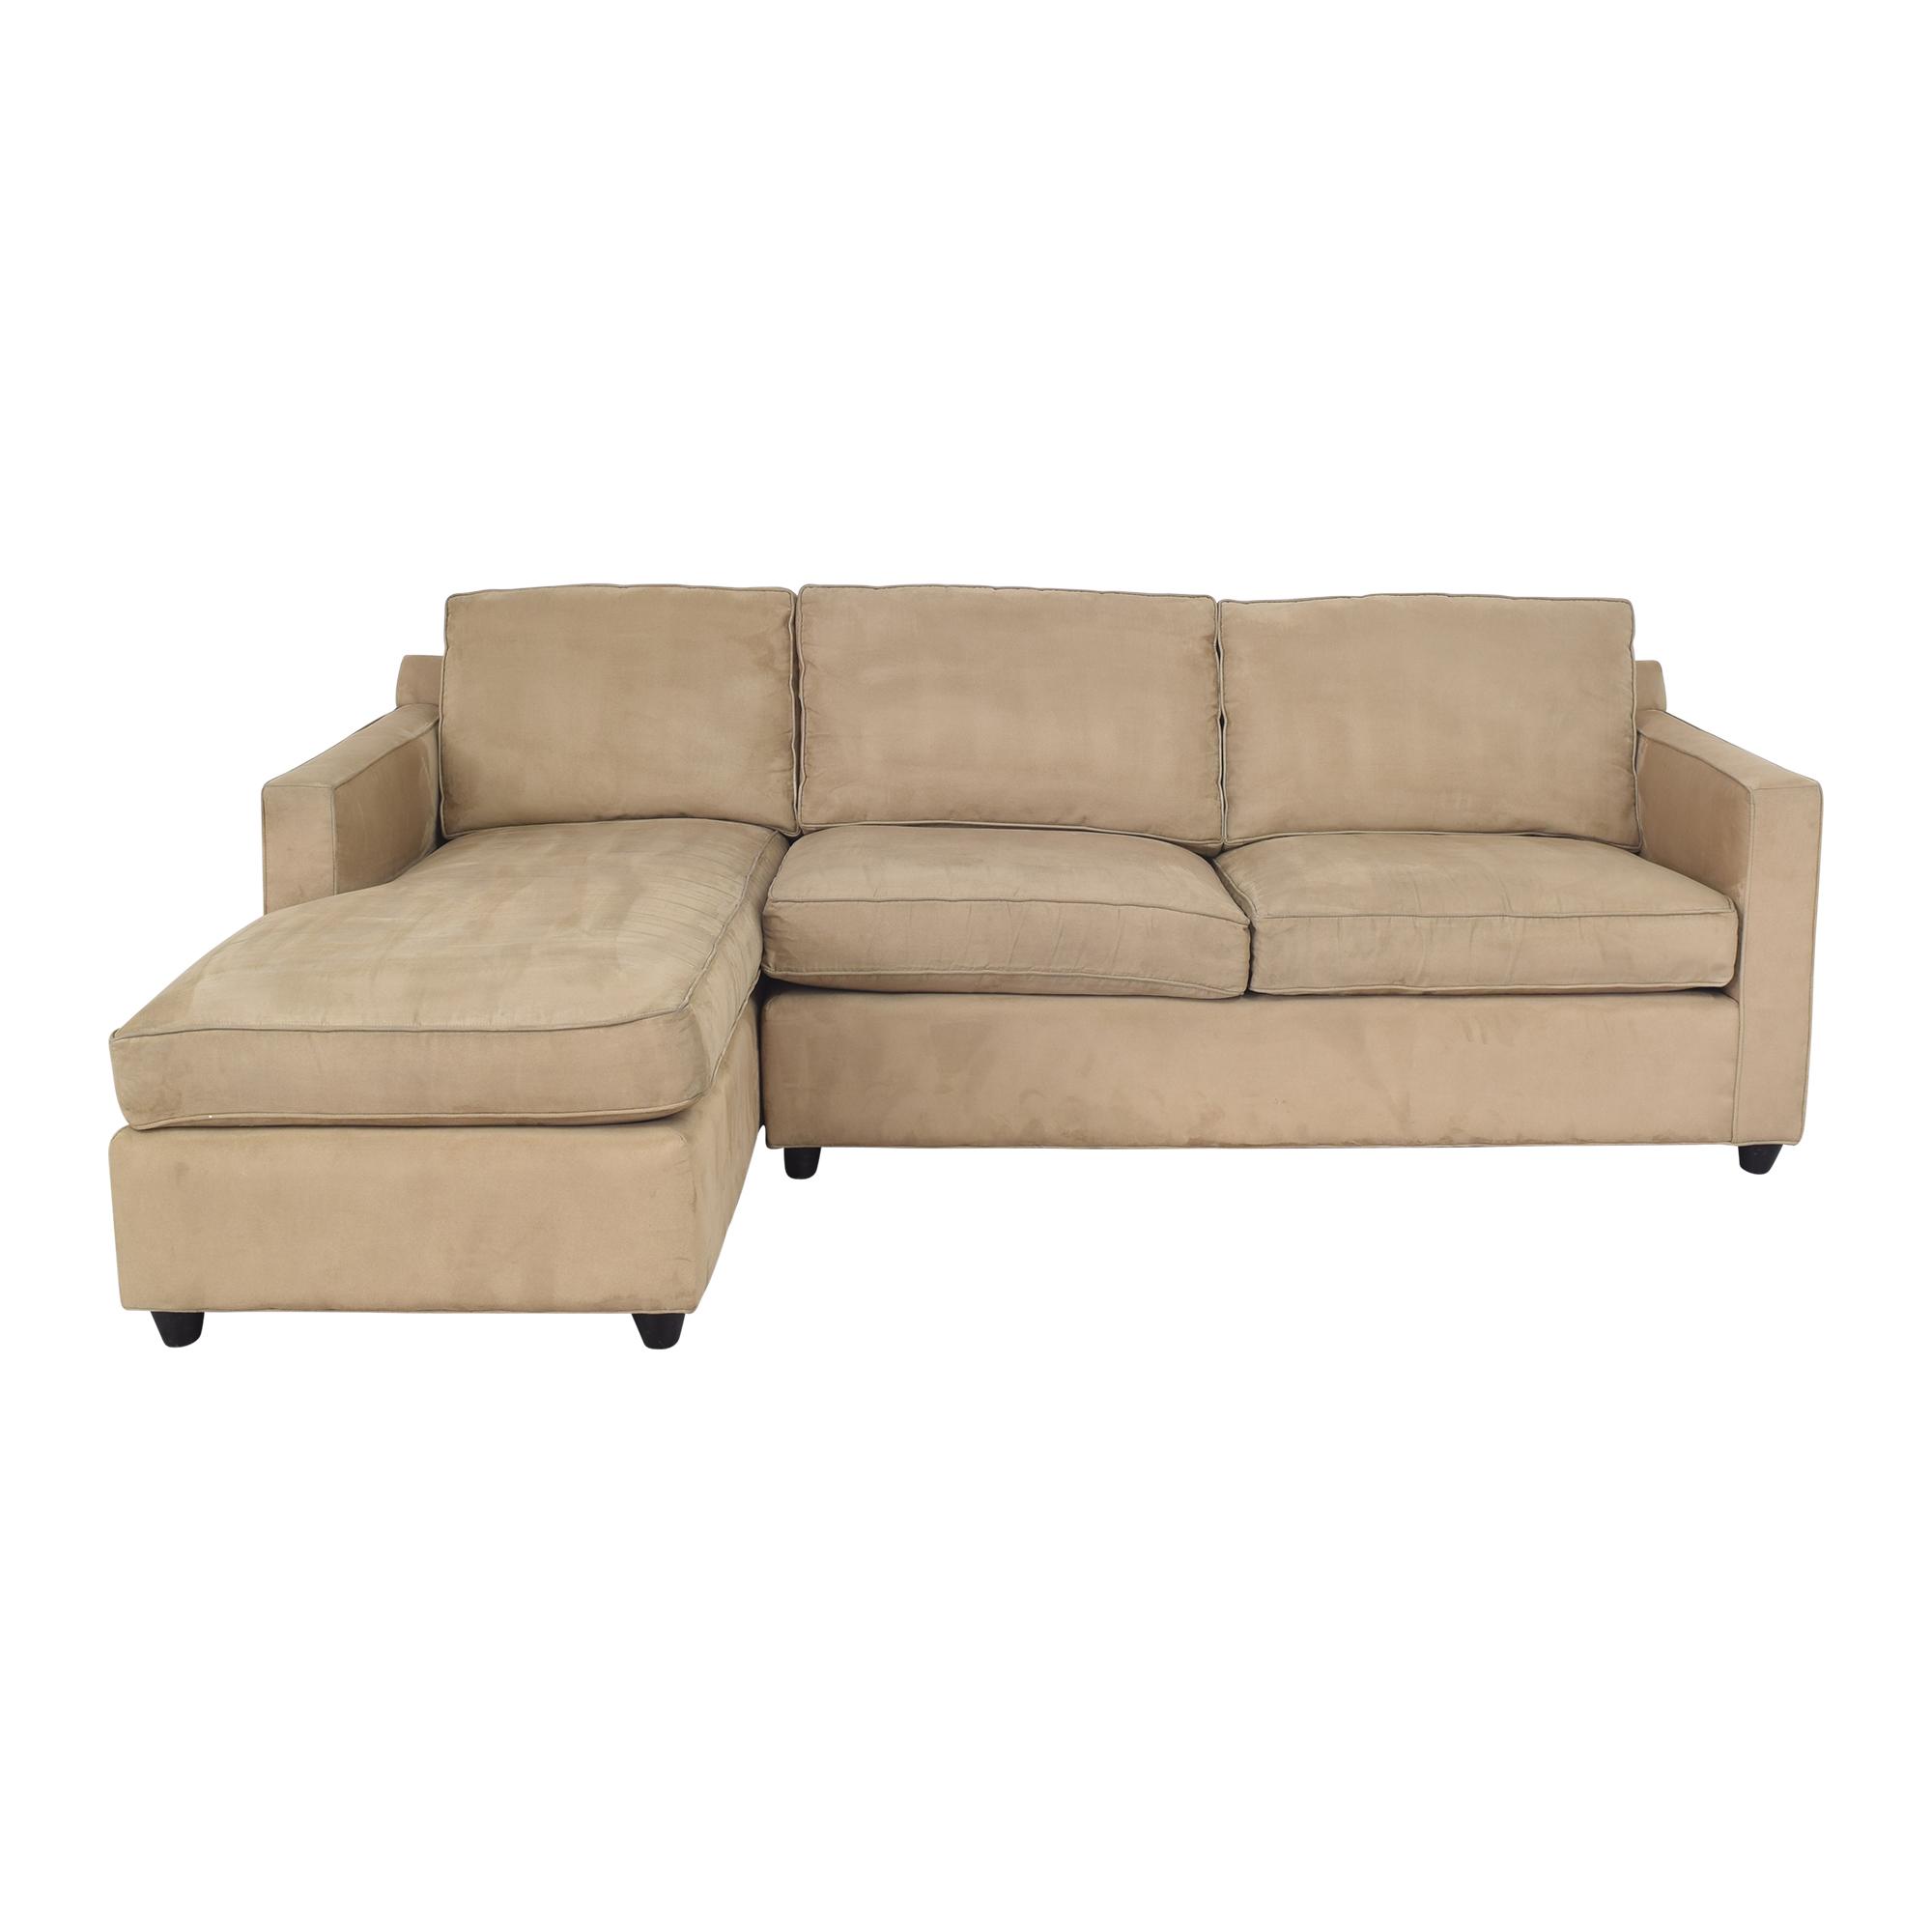 buy Crate & Barrel Barrett Chaise Sectional Sofa Crate & Barrel Sectionals